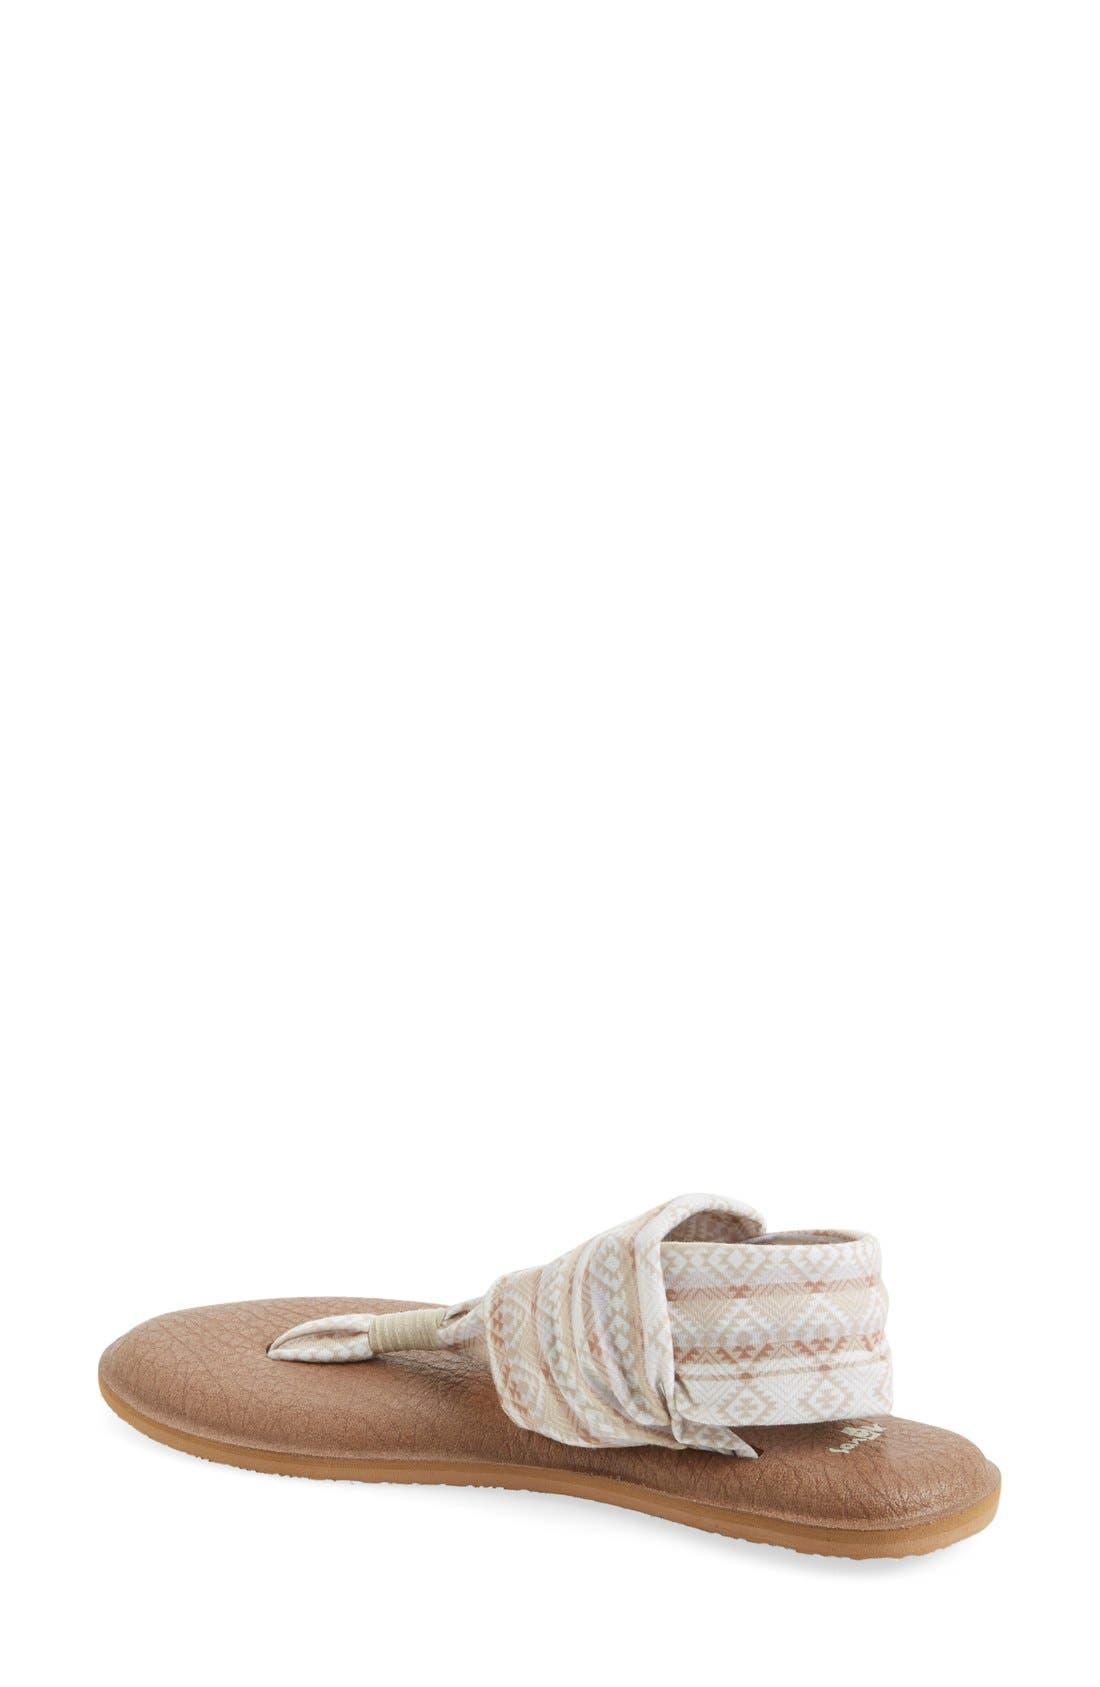 'Yoga Sling 2' Sandal,                             Alternate thumbnail 67, color,